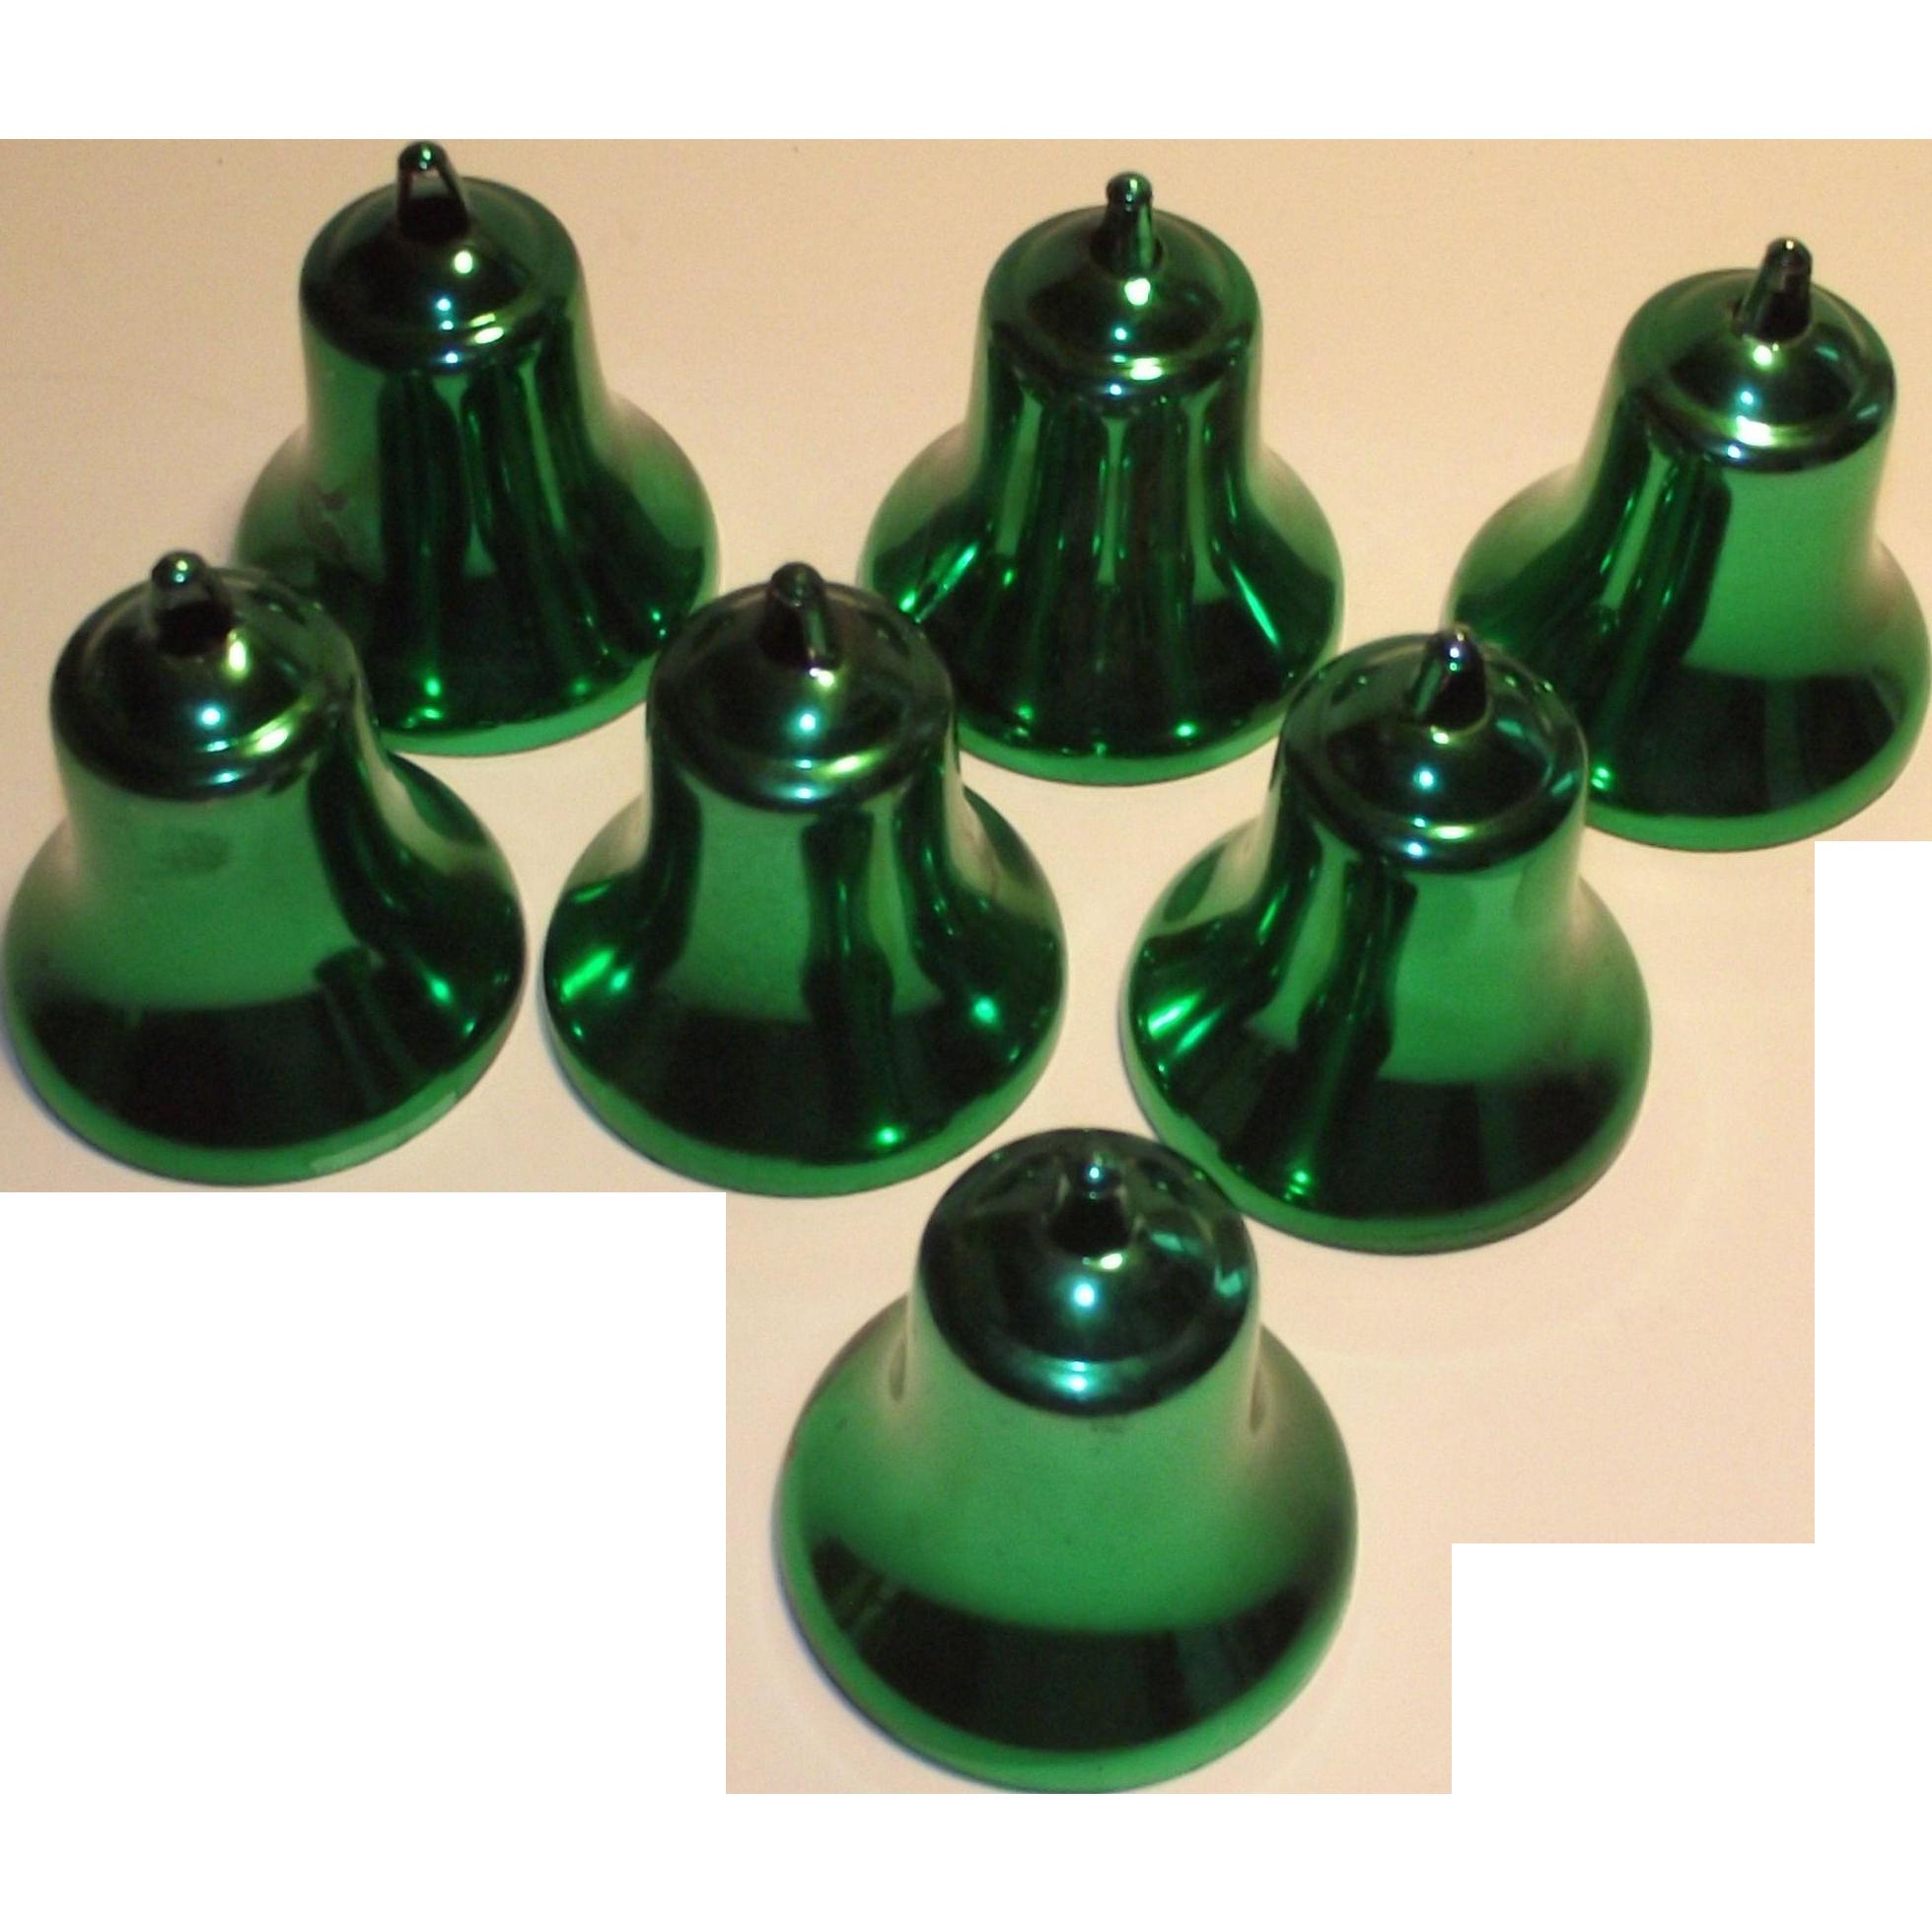 Vintage Mid Century Green Christmas Bell Ornaments 1960s Hard Plastic